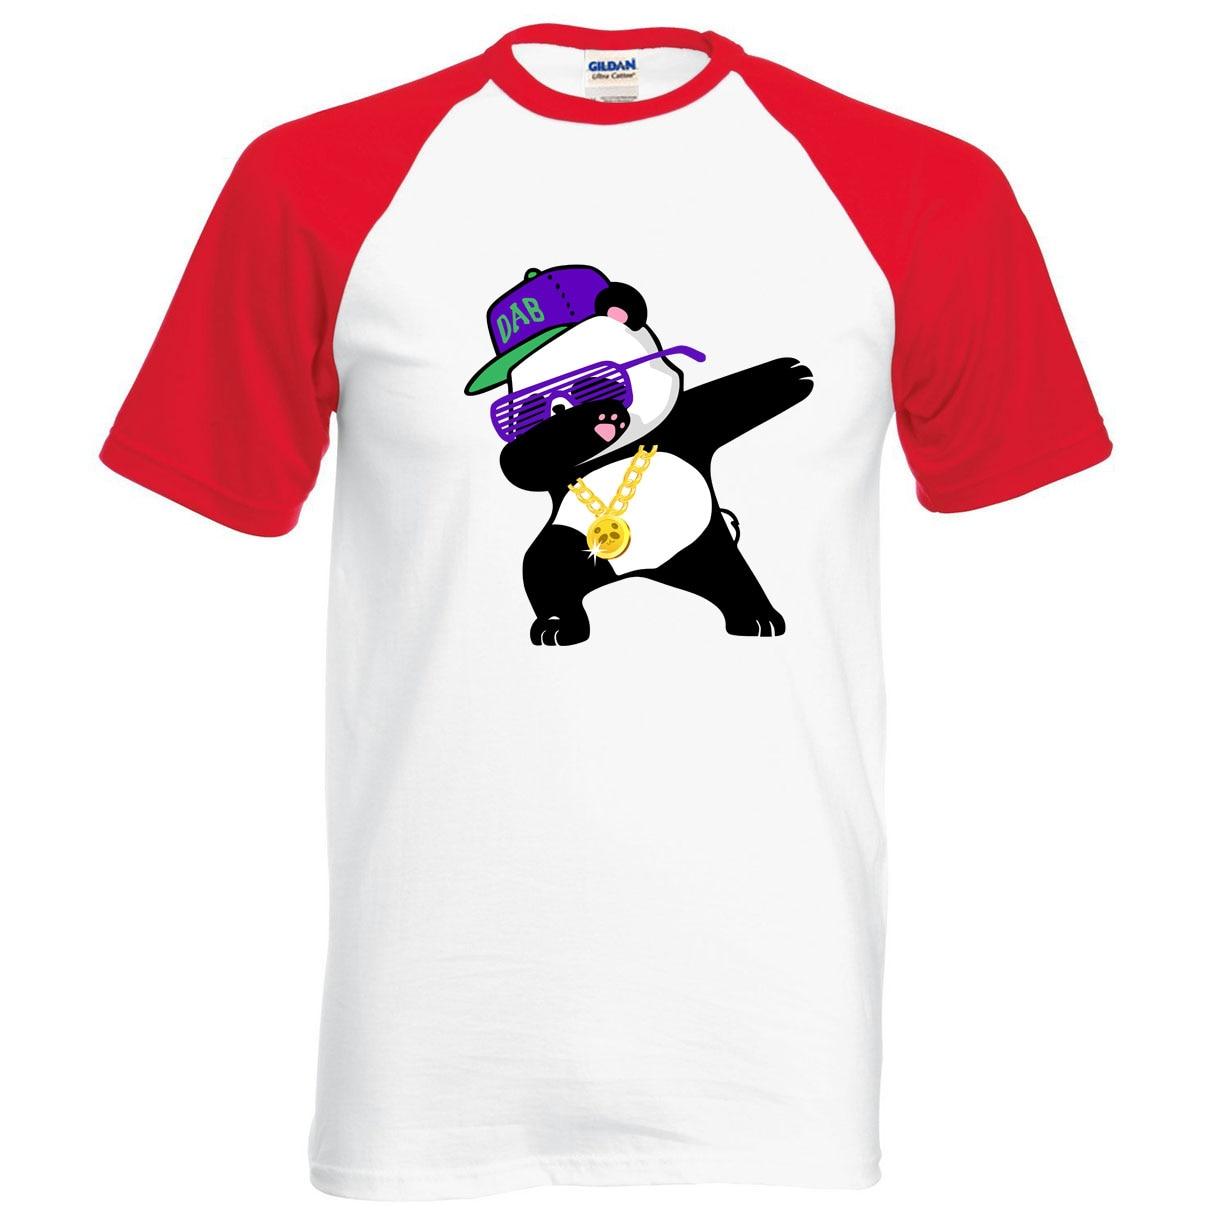 Panda Animal Print Men Raglan T Shirt 2019 Summer 100% Cotton Short Sleeve Men T-Shirts Loose Fit Style Casual Punk Tops Tees